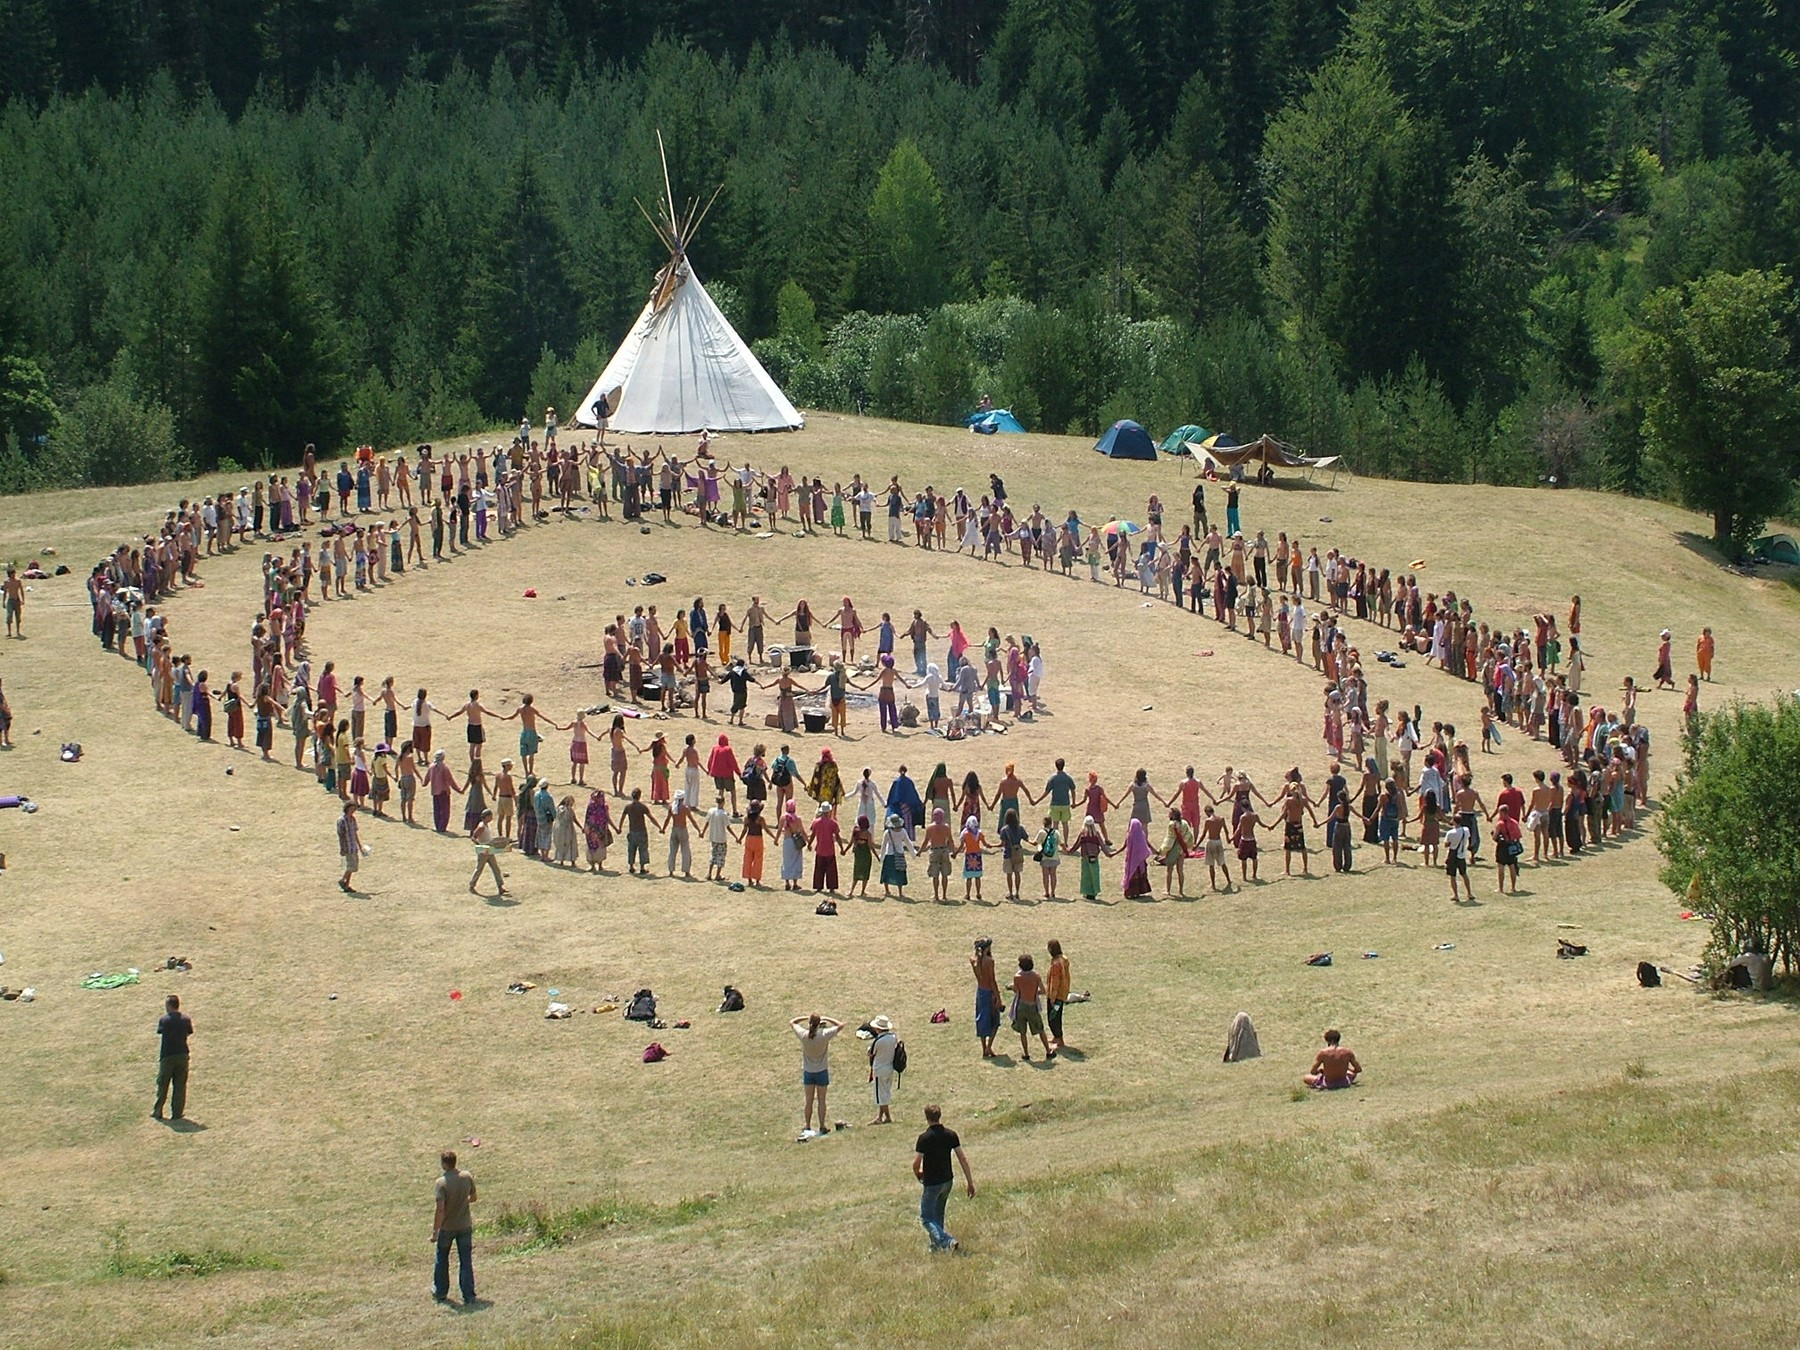 Rainbow_Gathering_Bosnia_2007.JPG